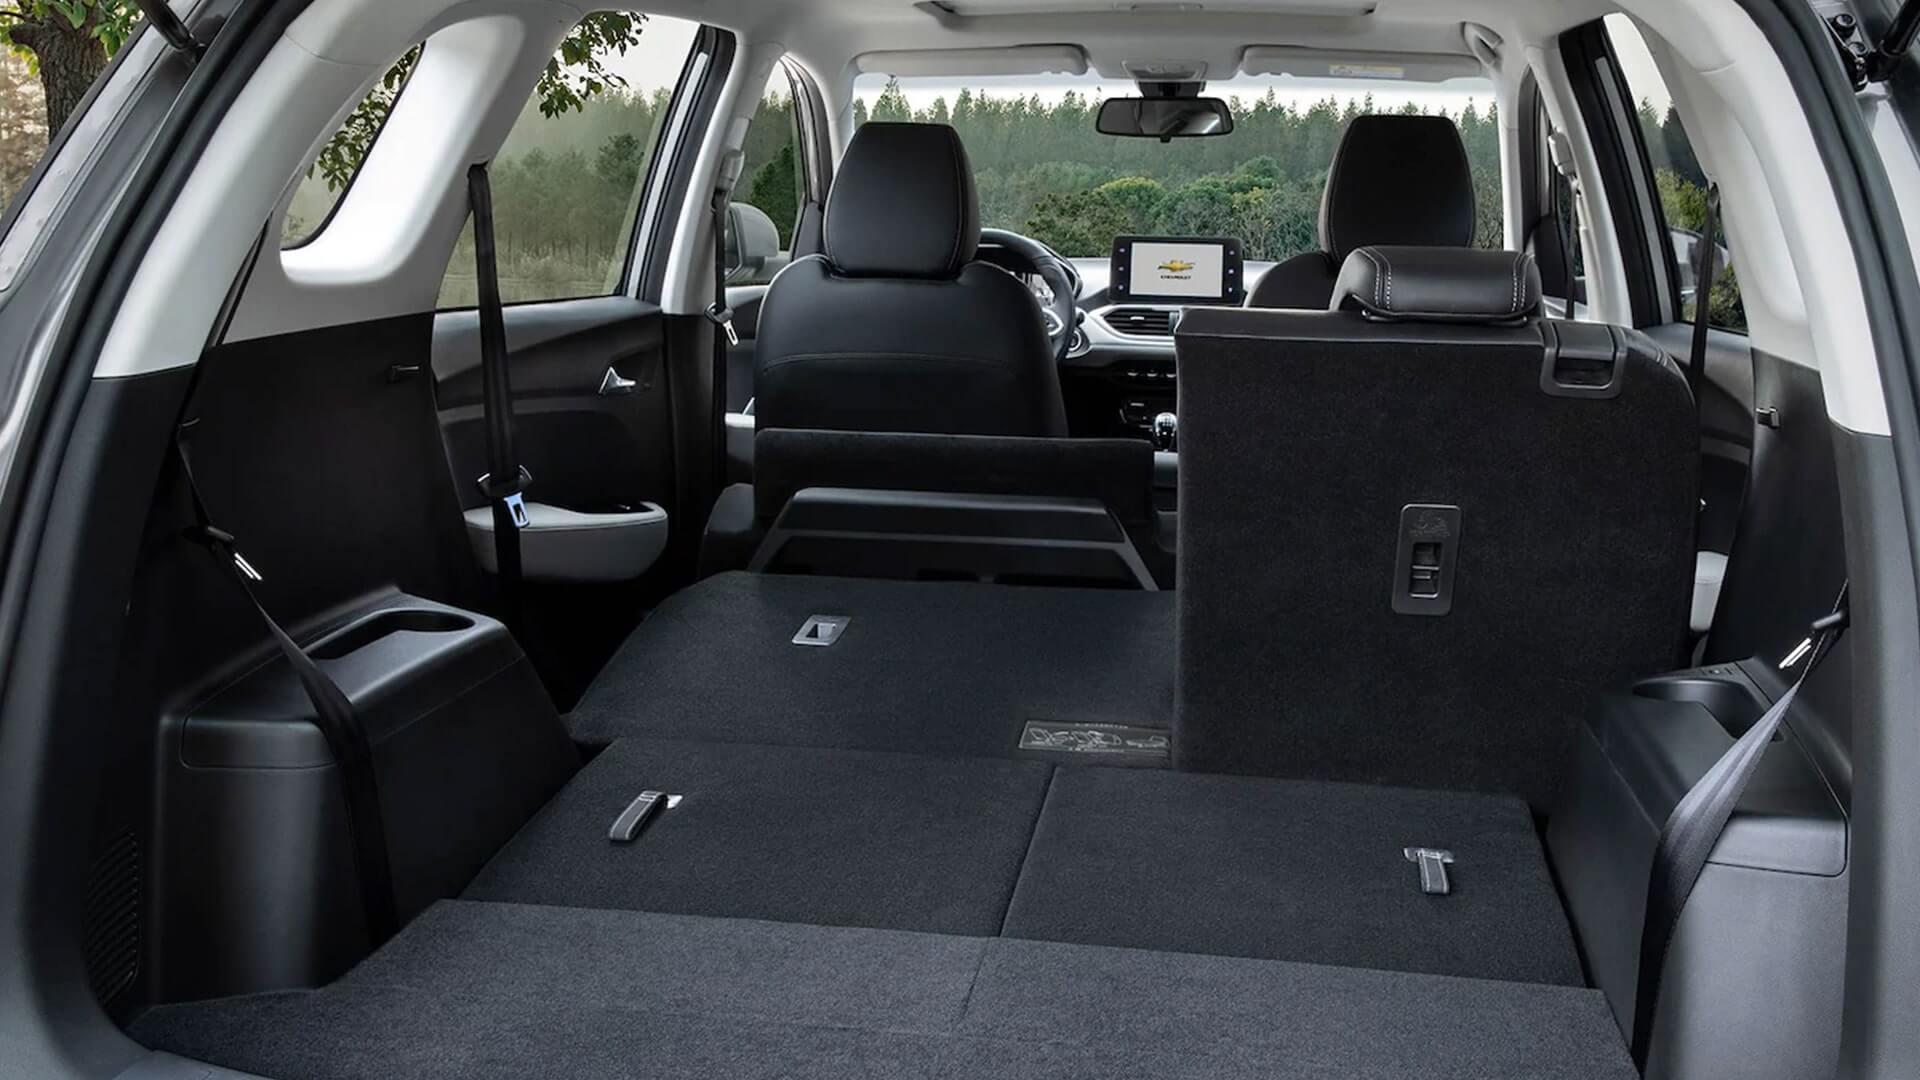 SUV Captiva Interior